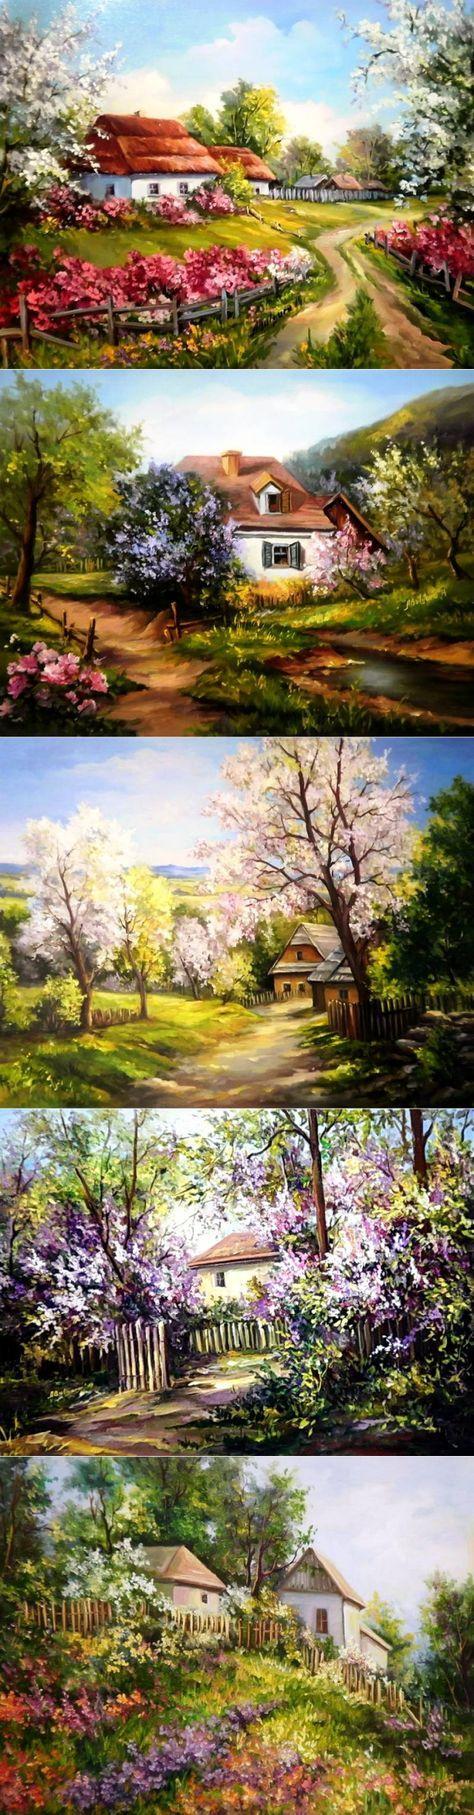 El paisaje Anca Bulgaru primaveral